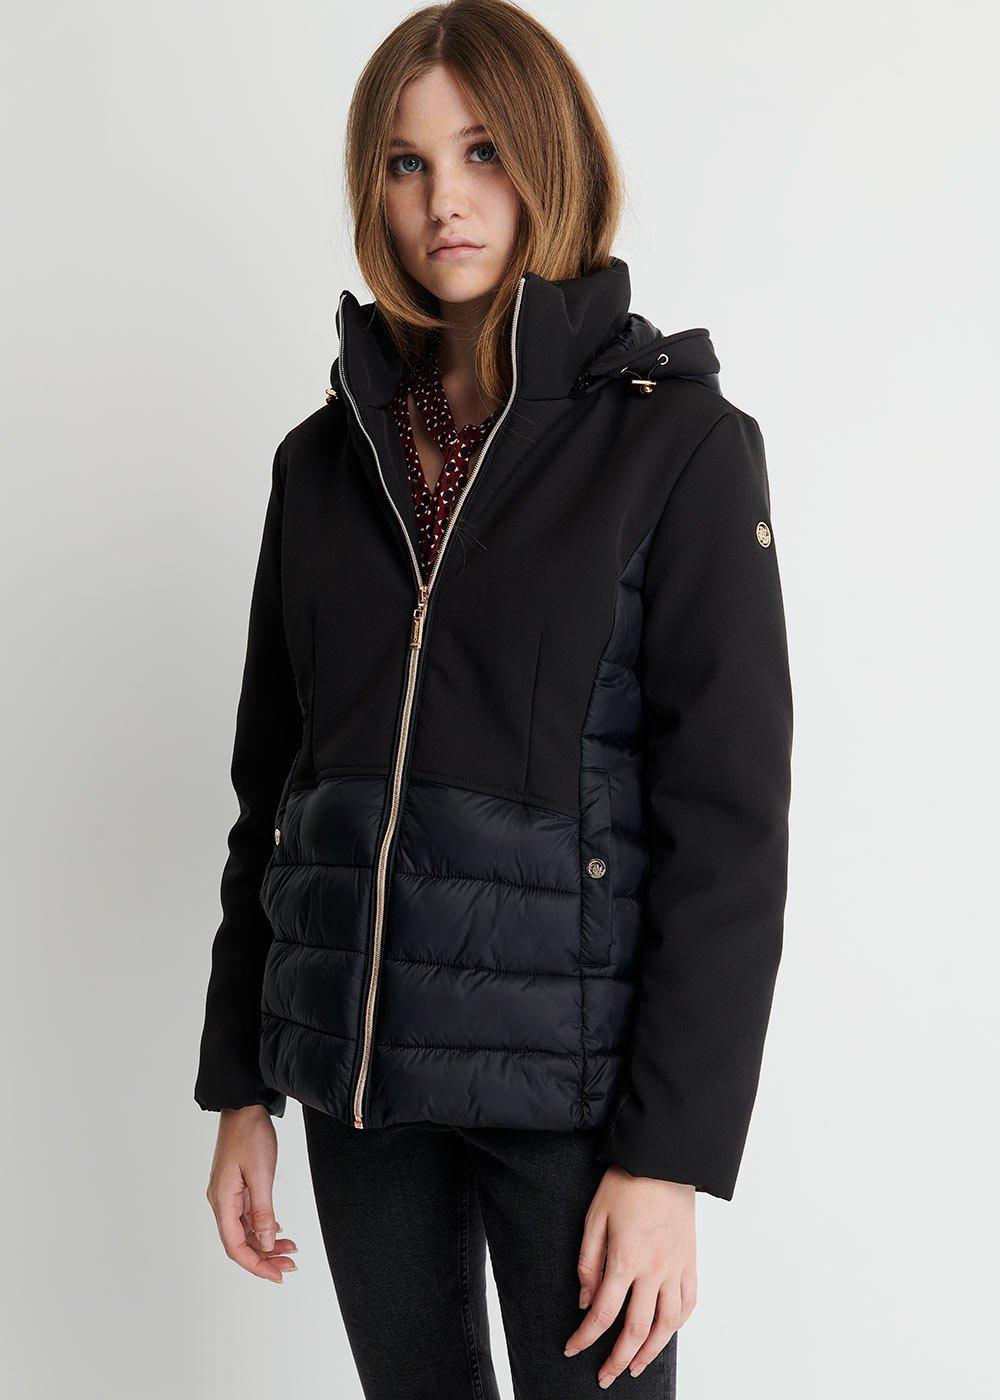 Pimer Shiny Nylon down jacket - Black - Woman